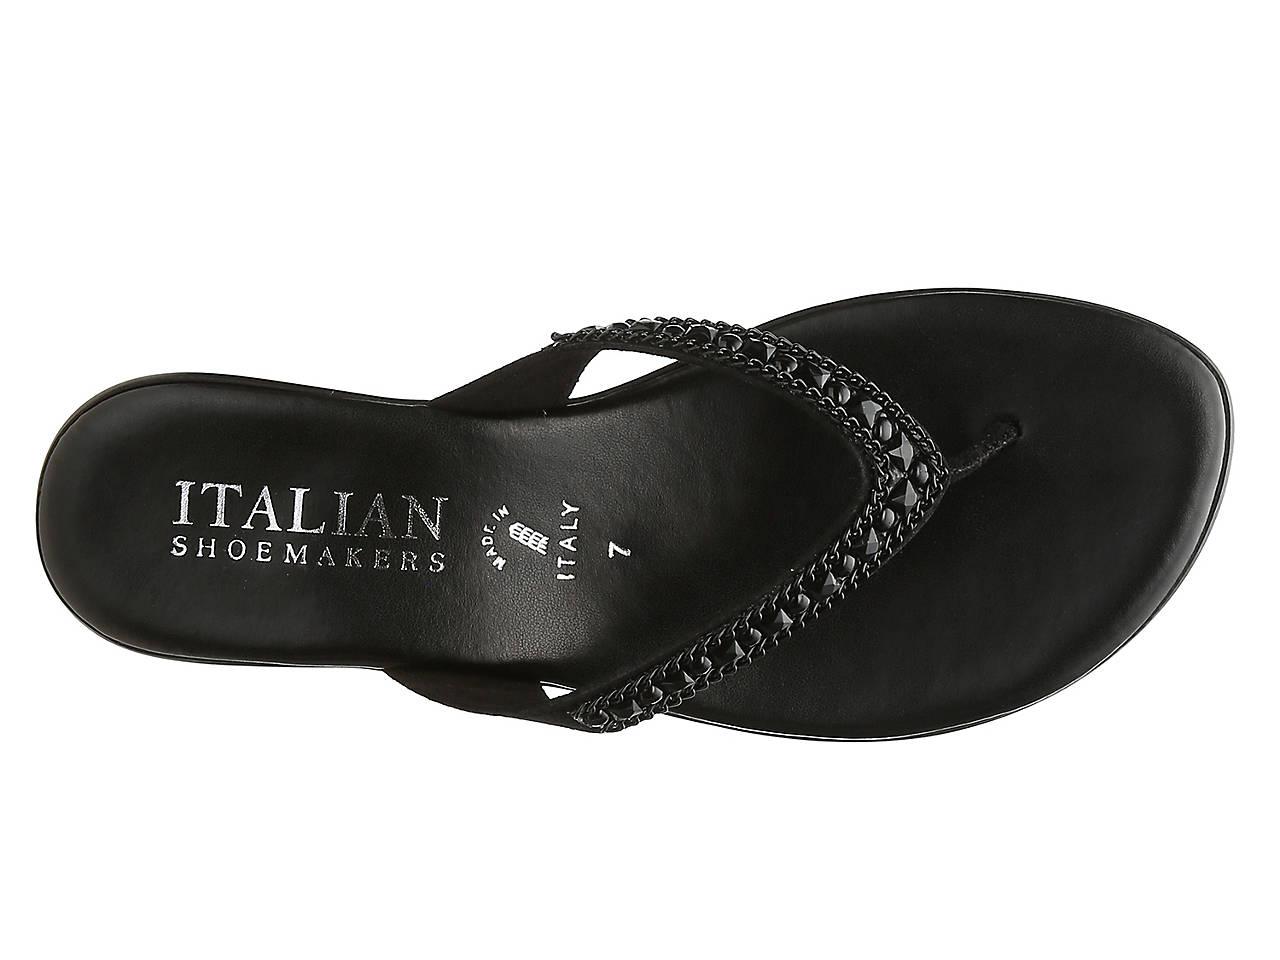 22b5dc0716f Italian Shoemakers Hartley Wedge Sandal Women s Shoes